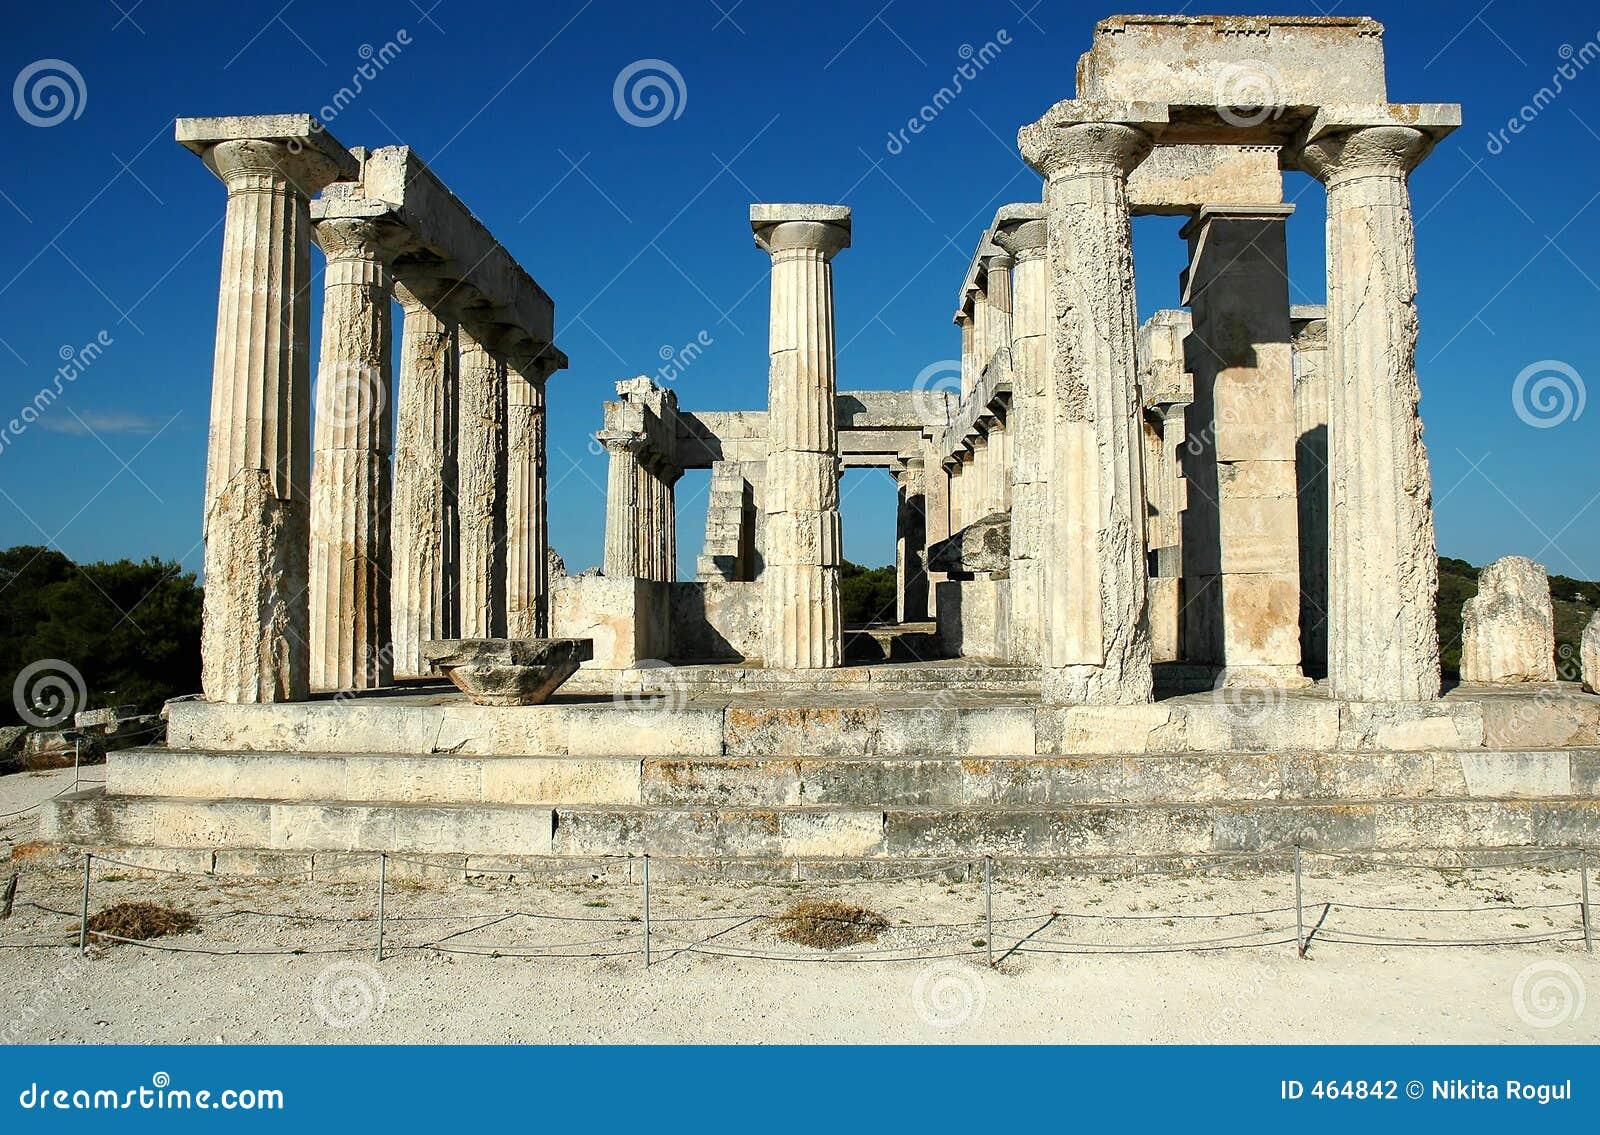 Download Temple Of Aphaea (Britomartis) Stock Photo - Image of aigina, column: 464842